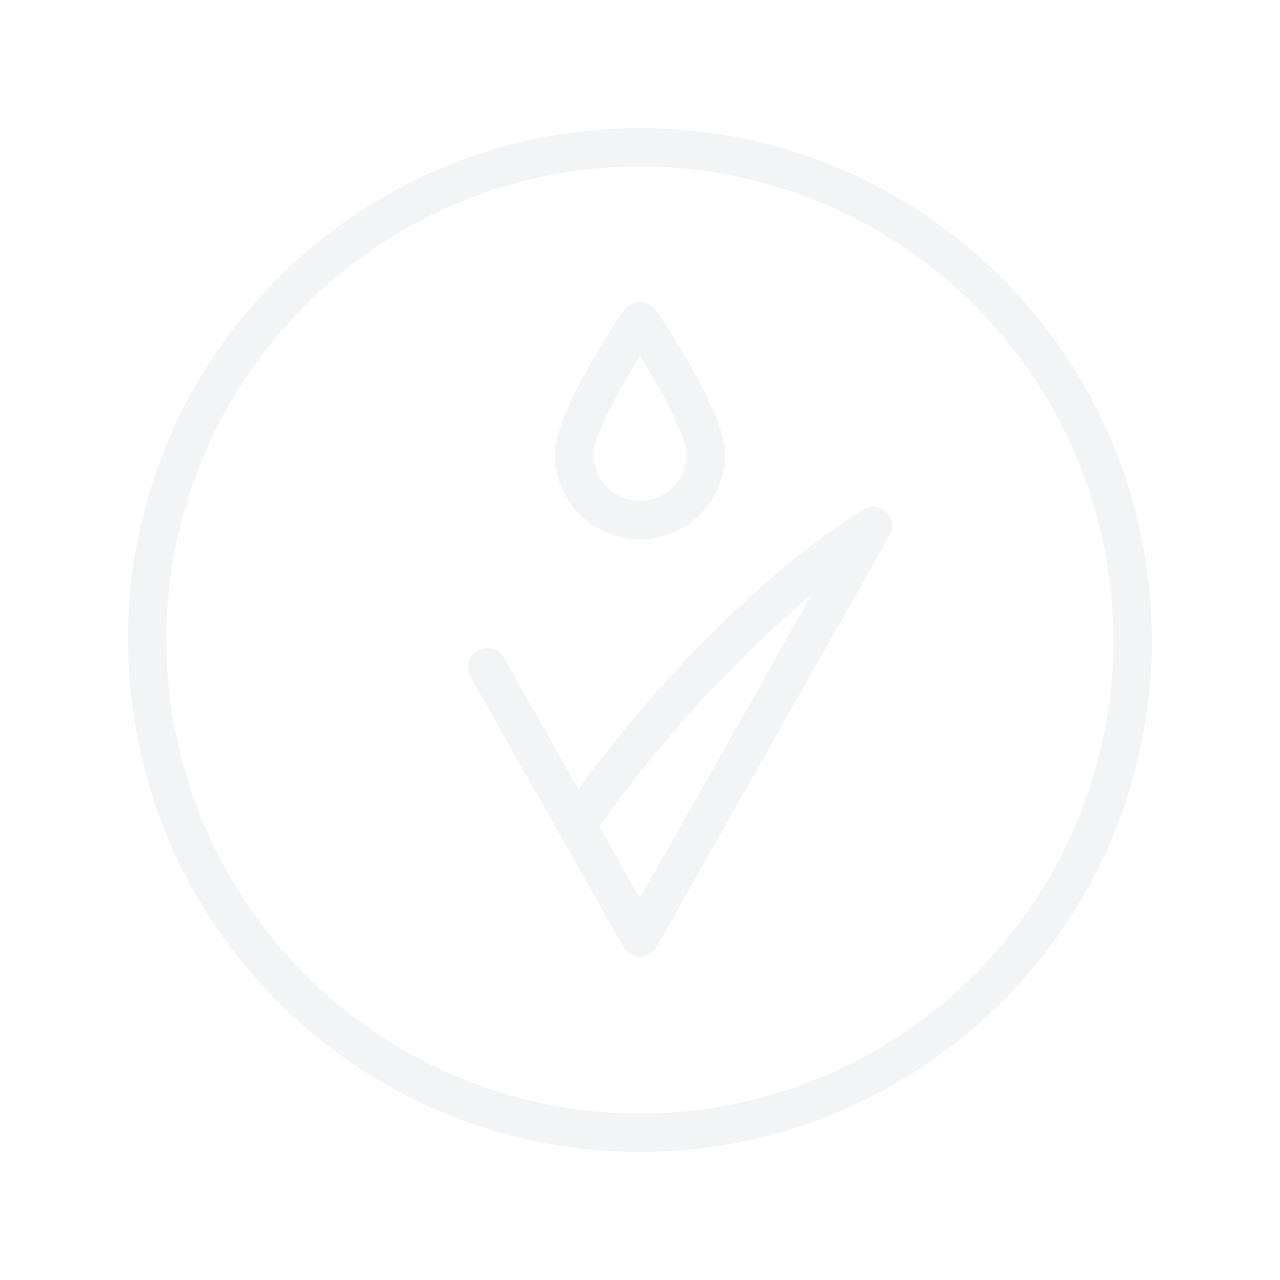 LUMENE Valo Glow Reveal Vitamin C Moisturizer (All Skins) 50ml